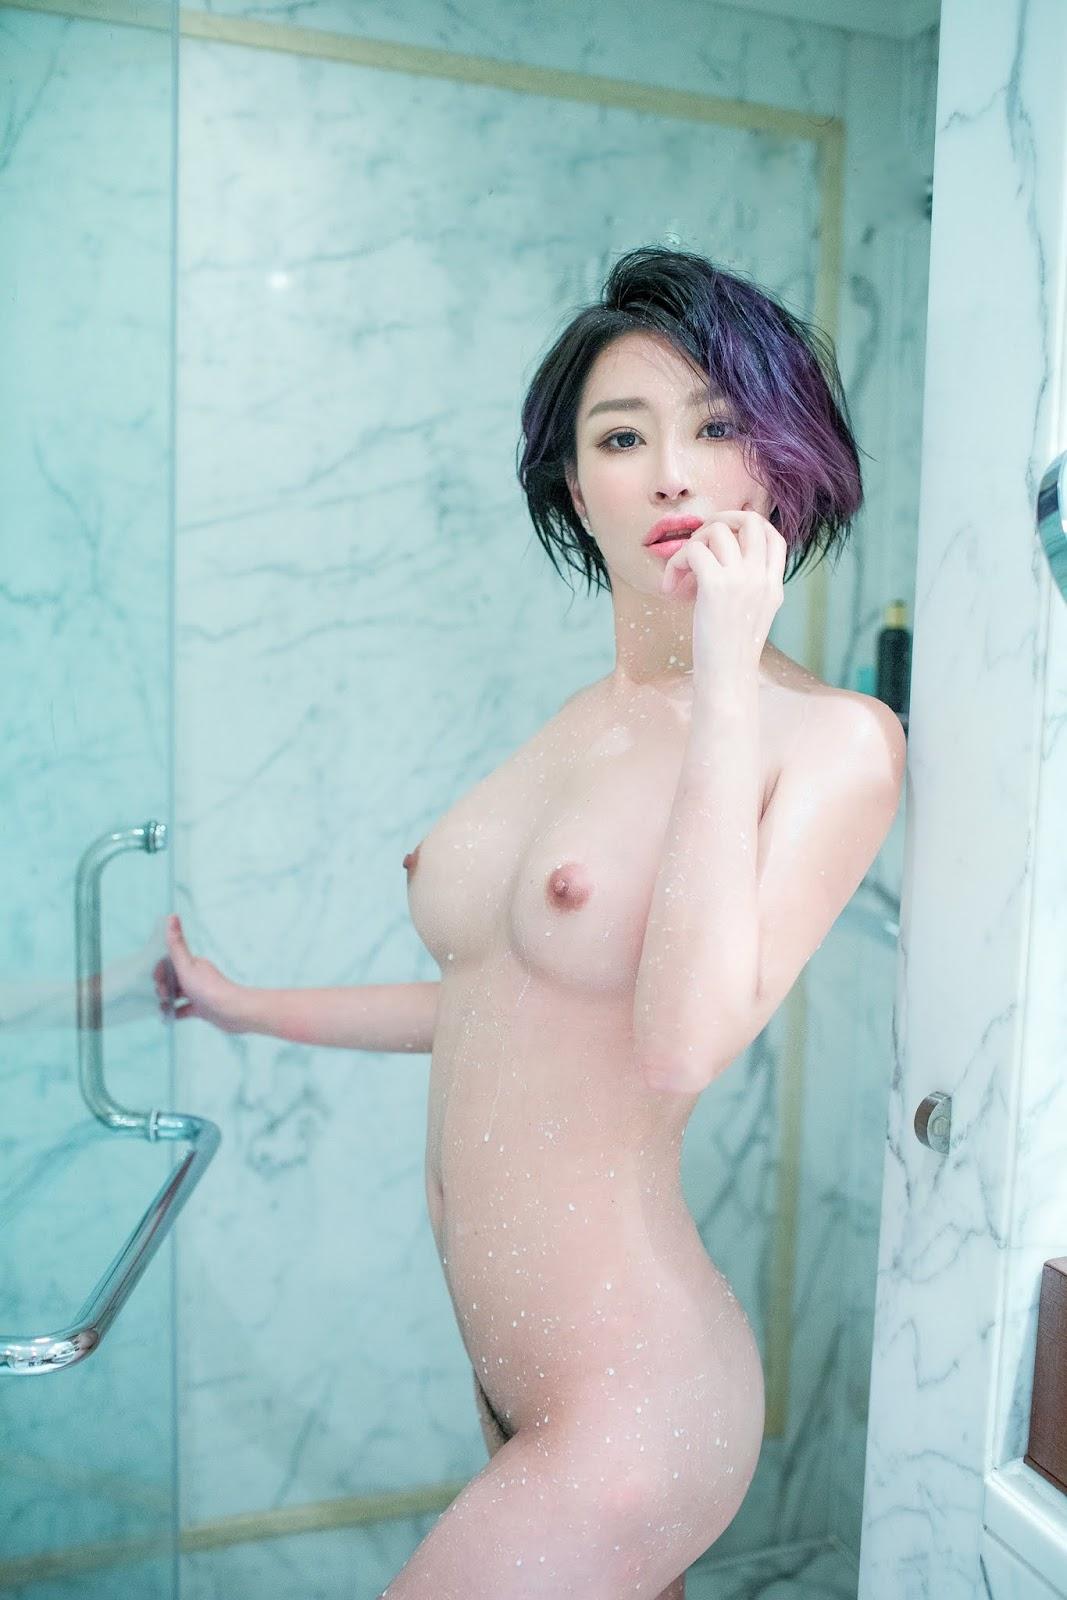 024 - Nude Girl TUIGIRL NO.45 Sexy Love Pussy